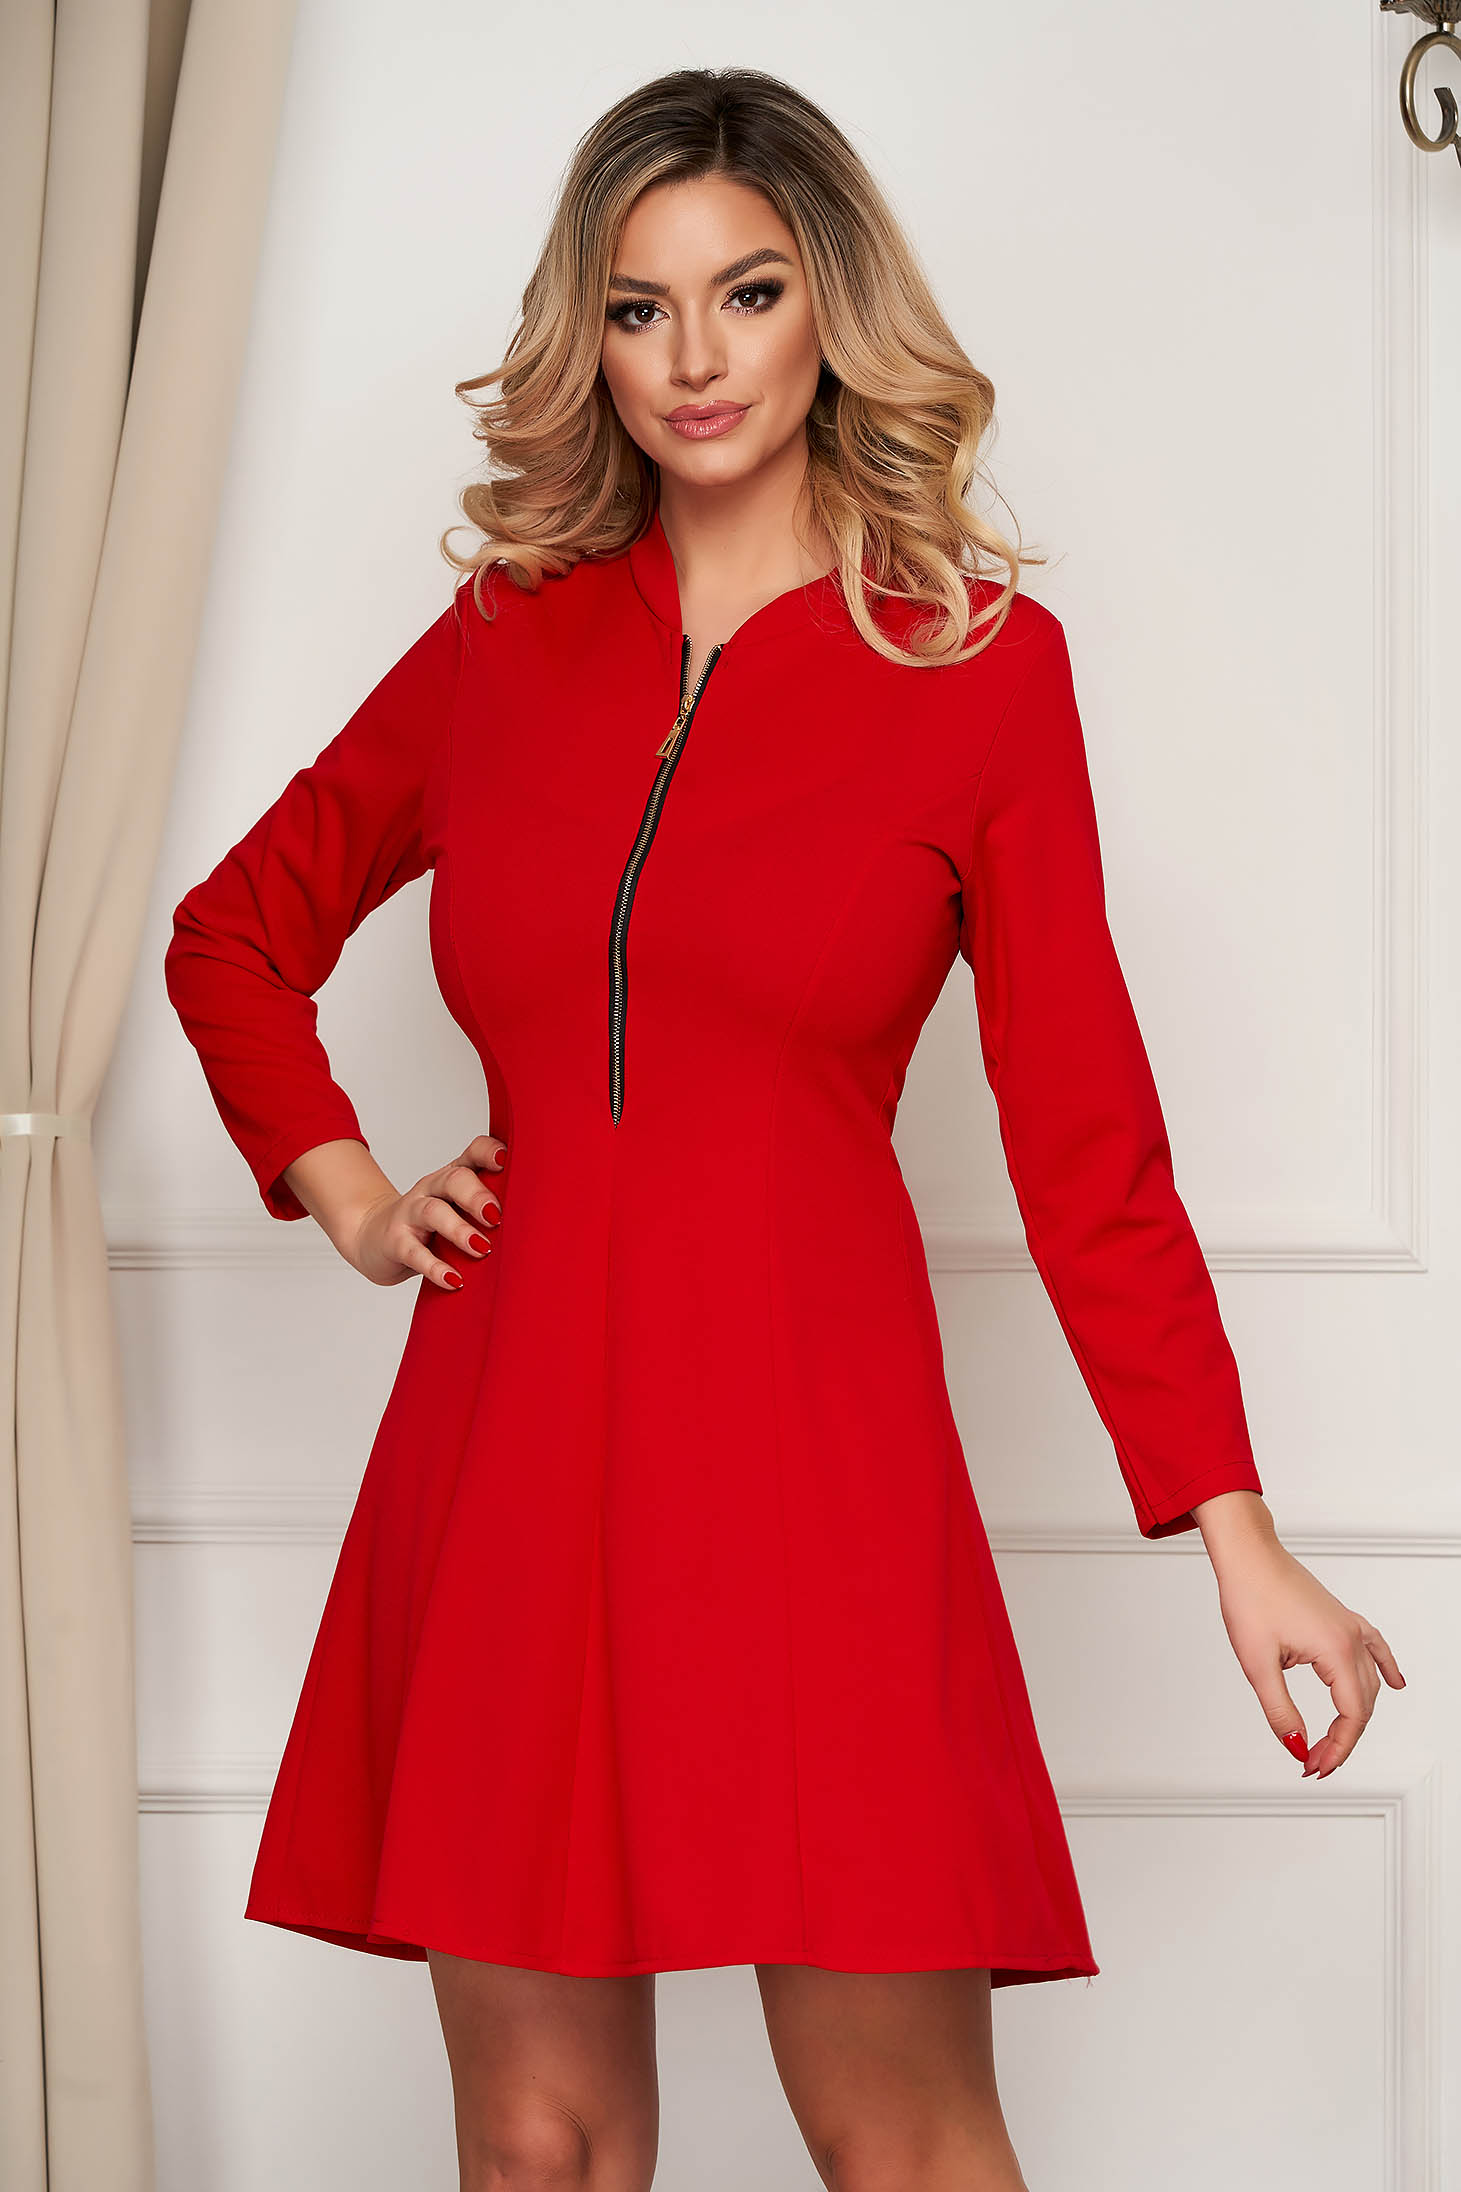 Red dress short cut clubbing cloche from elastic fabric zipper fastening